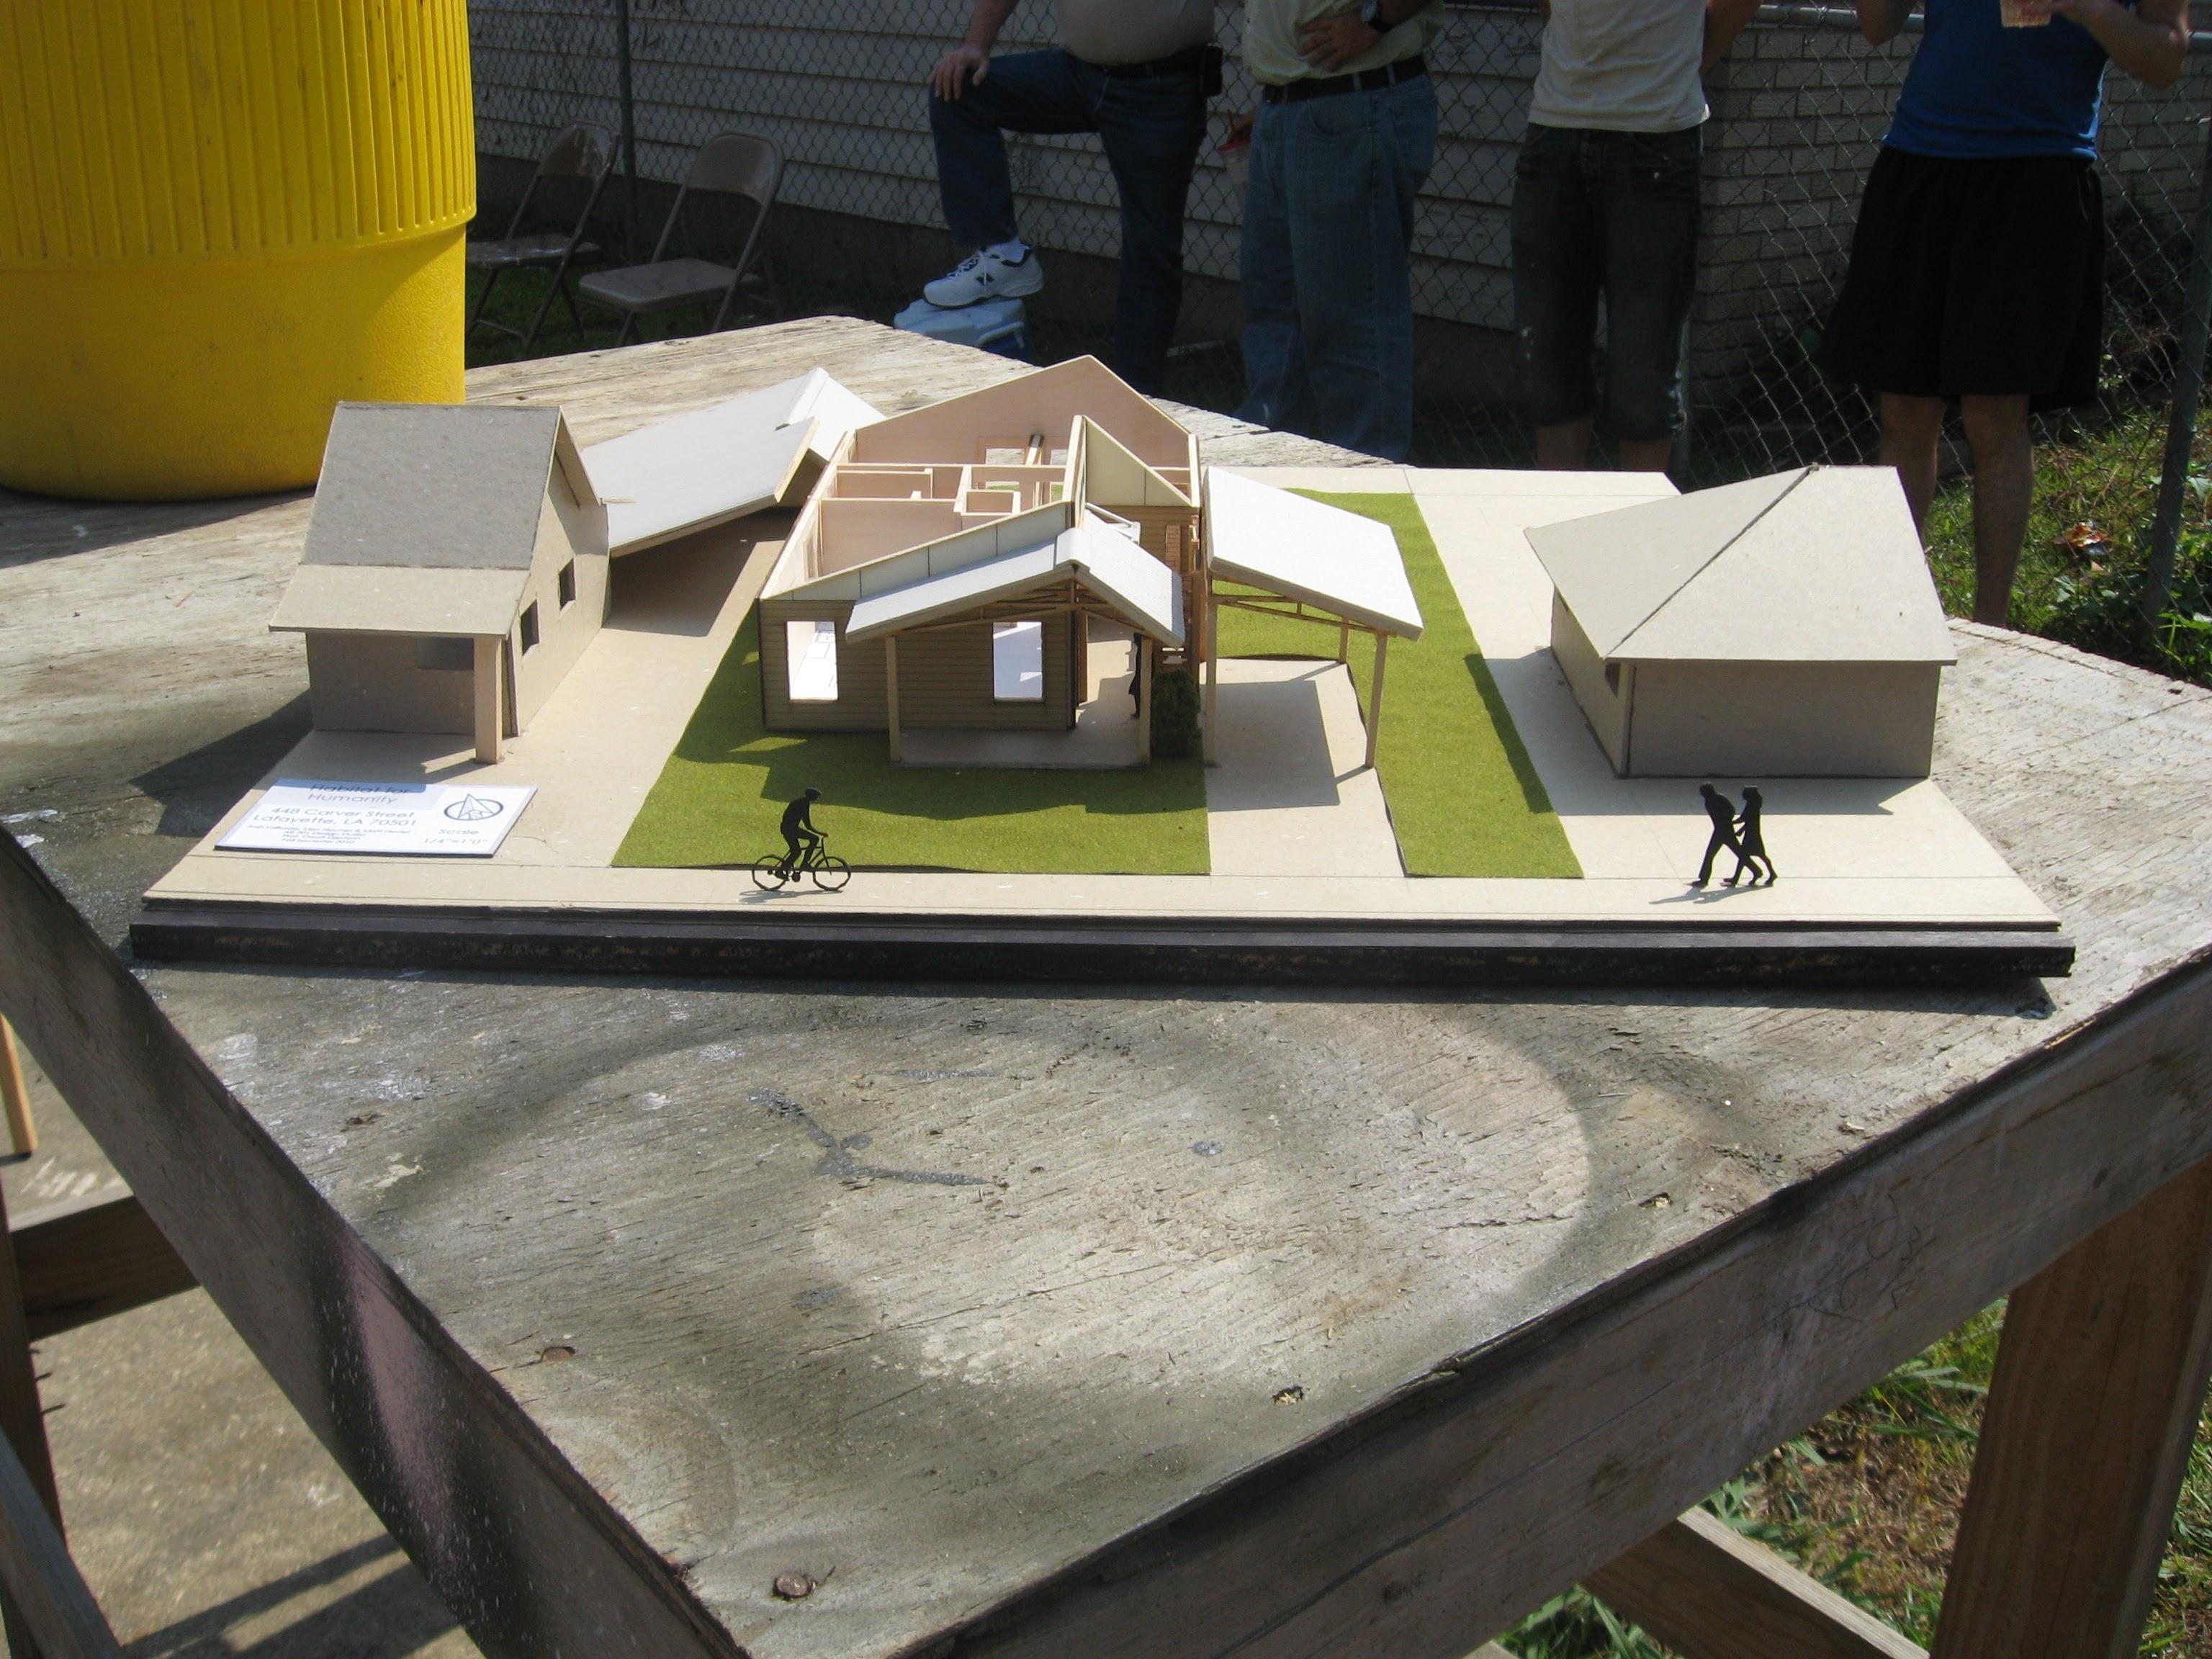 Habitat home model